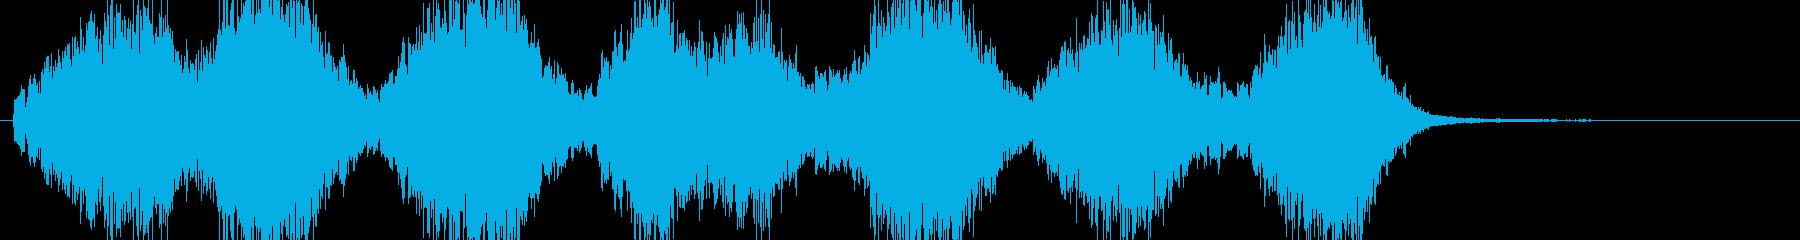 no.1 ダークマター、科学、宇宙 B9の再生済みの波形